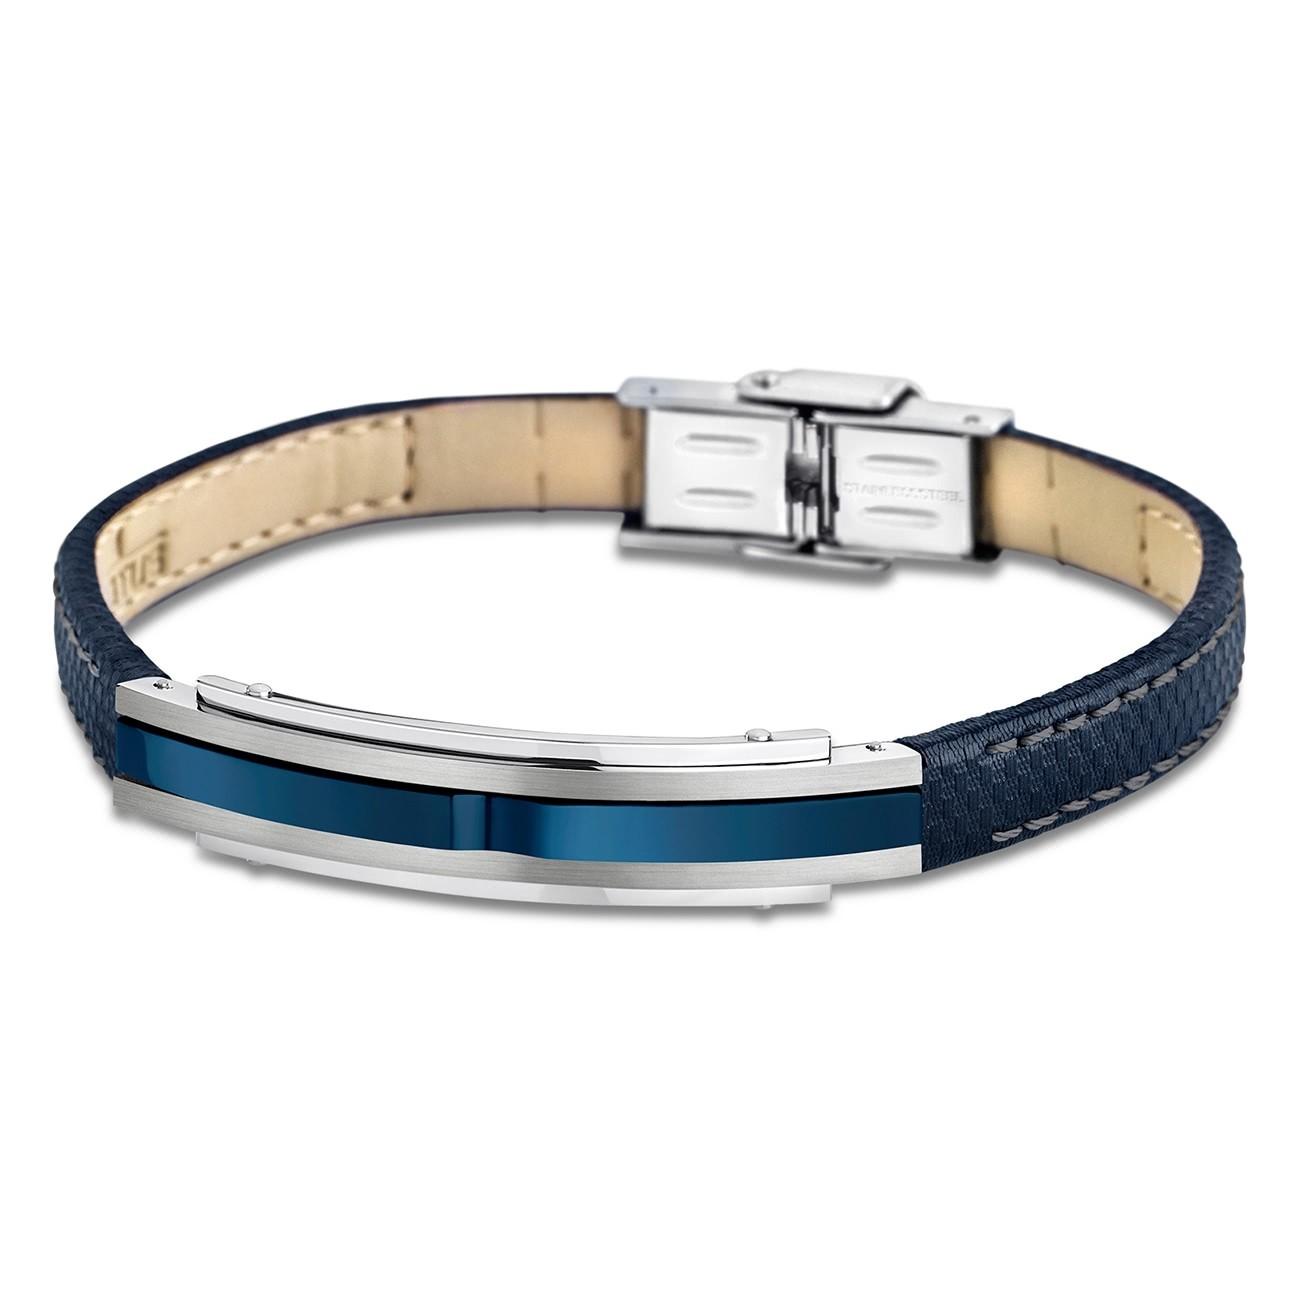 LOTUS Style Armband Herren Leder silber blau LS1809-2/2 Urban JLS1809-2-2